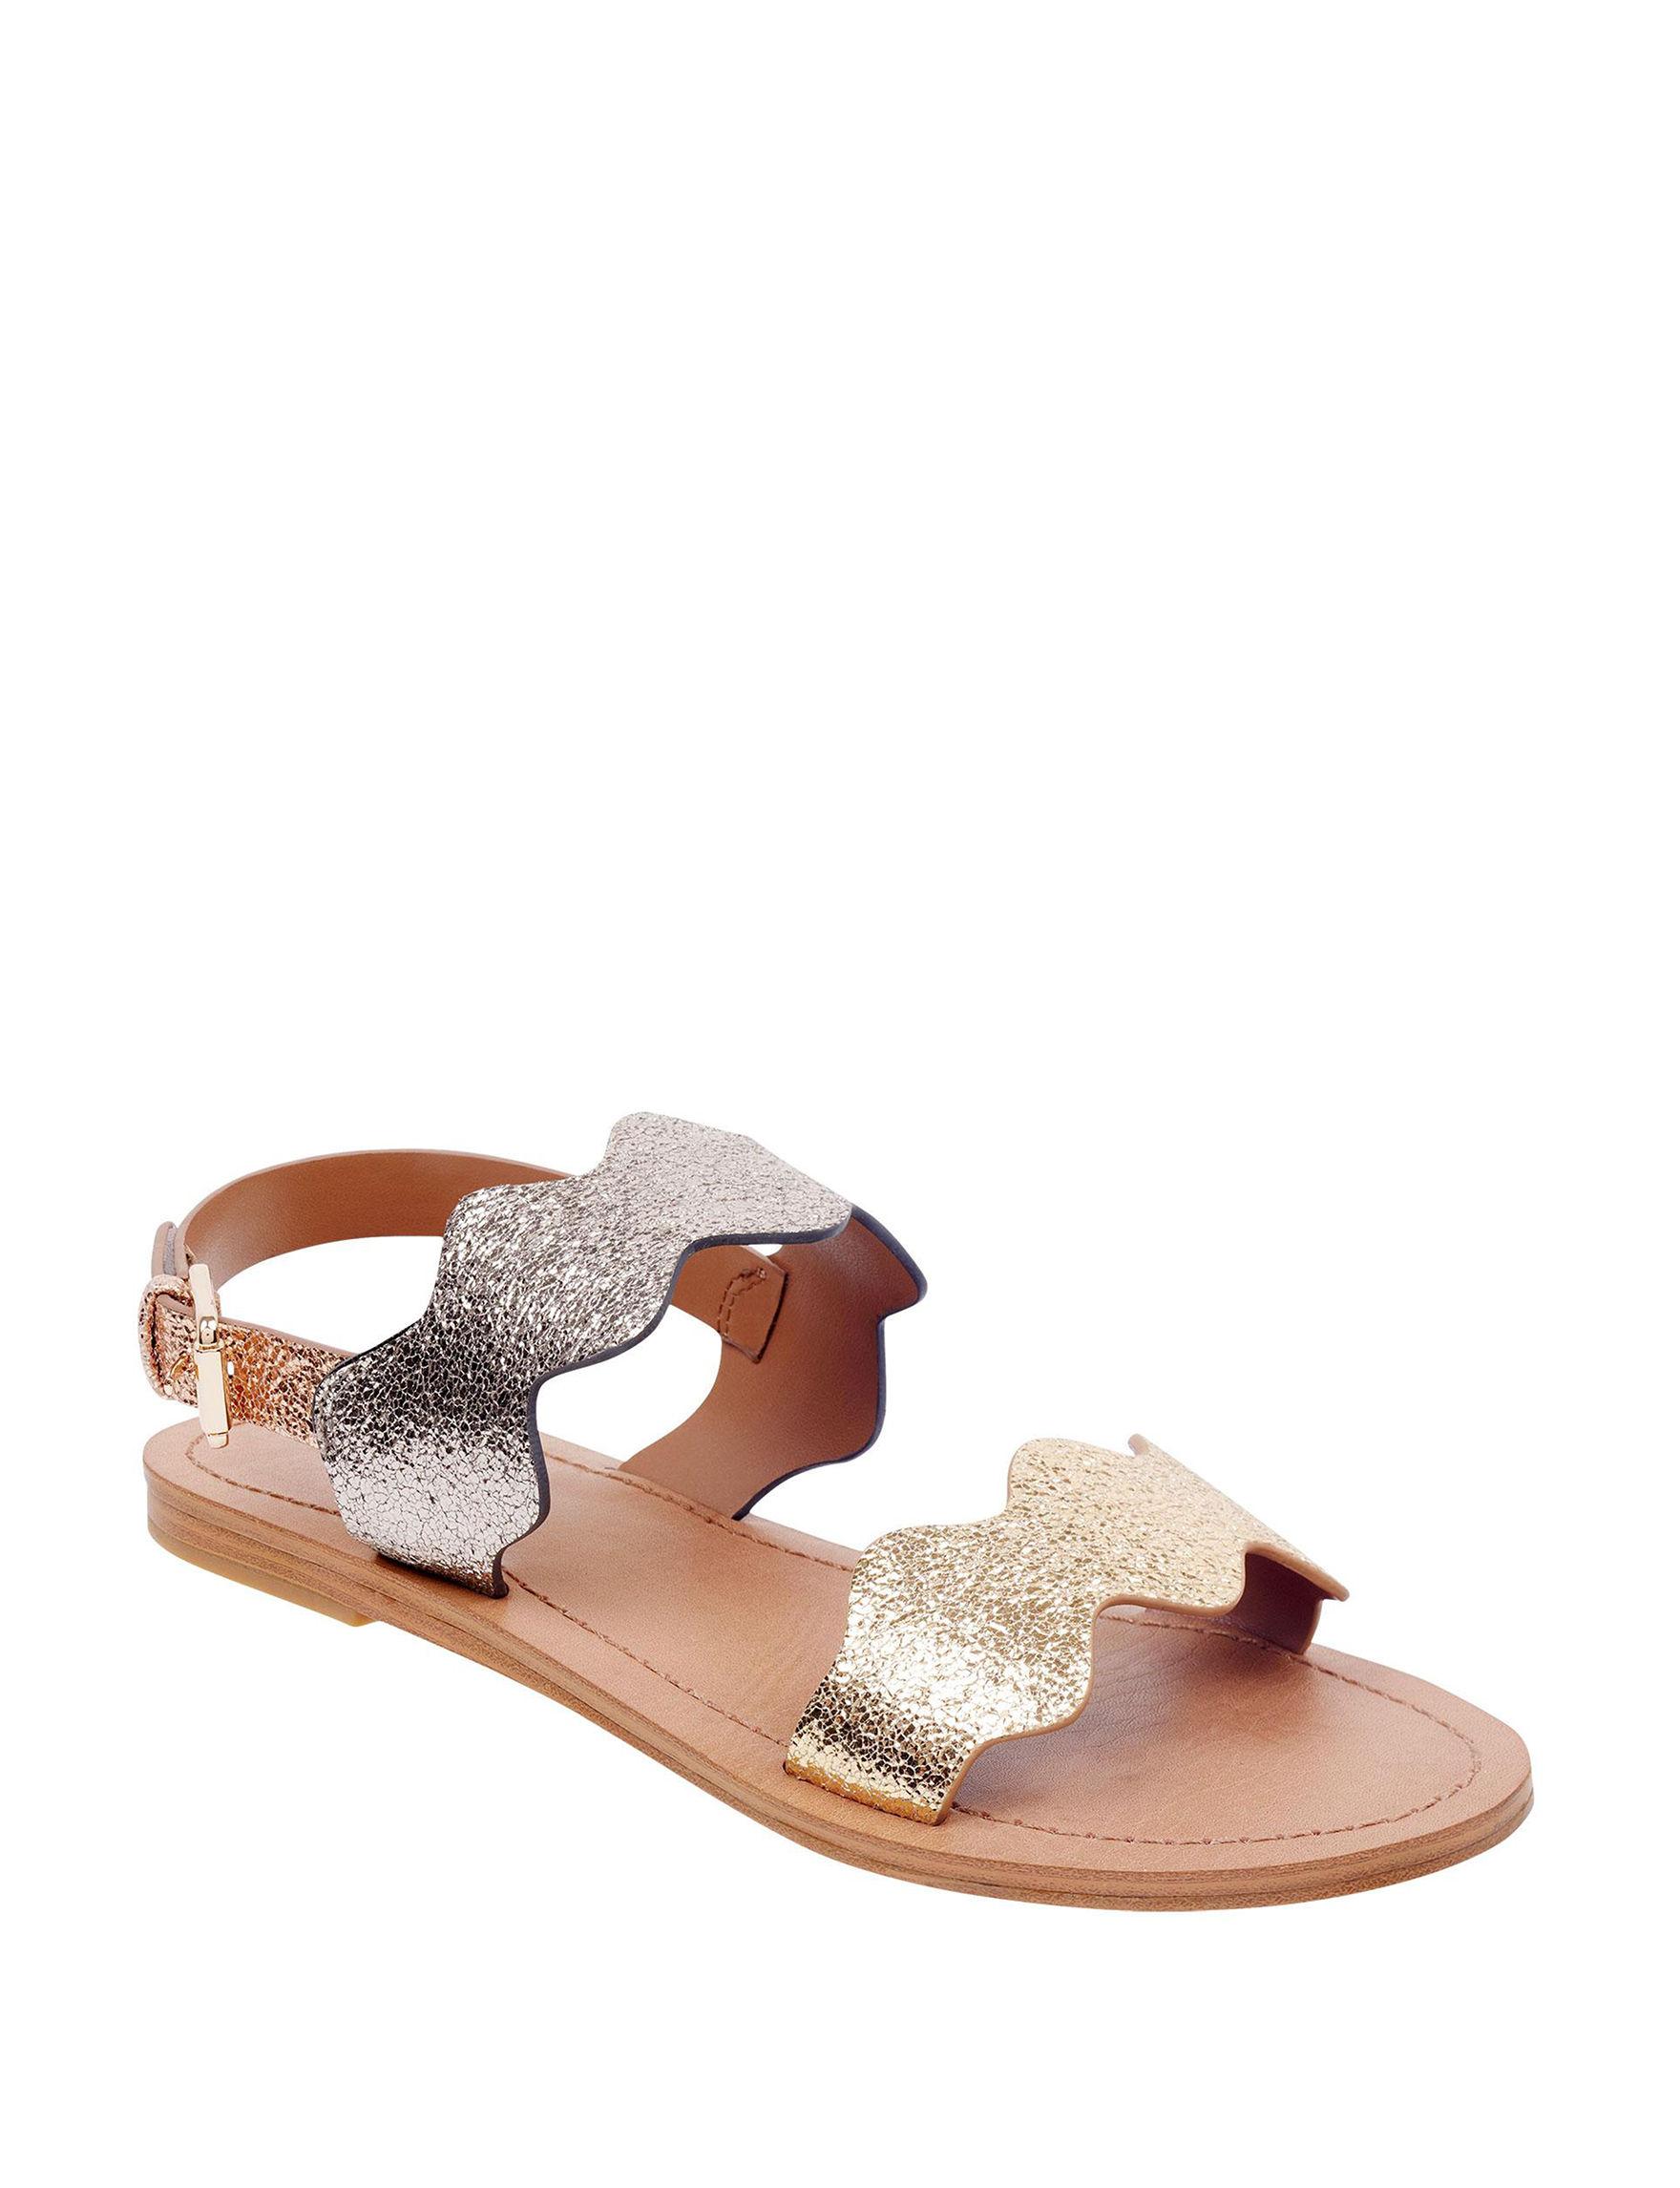 Indigo Rd. Silver / Gold Flat Sandals